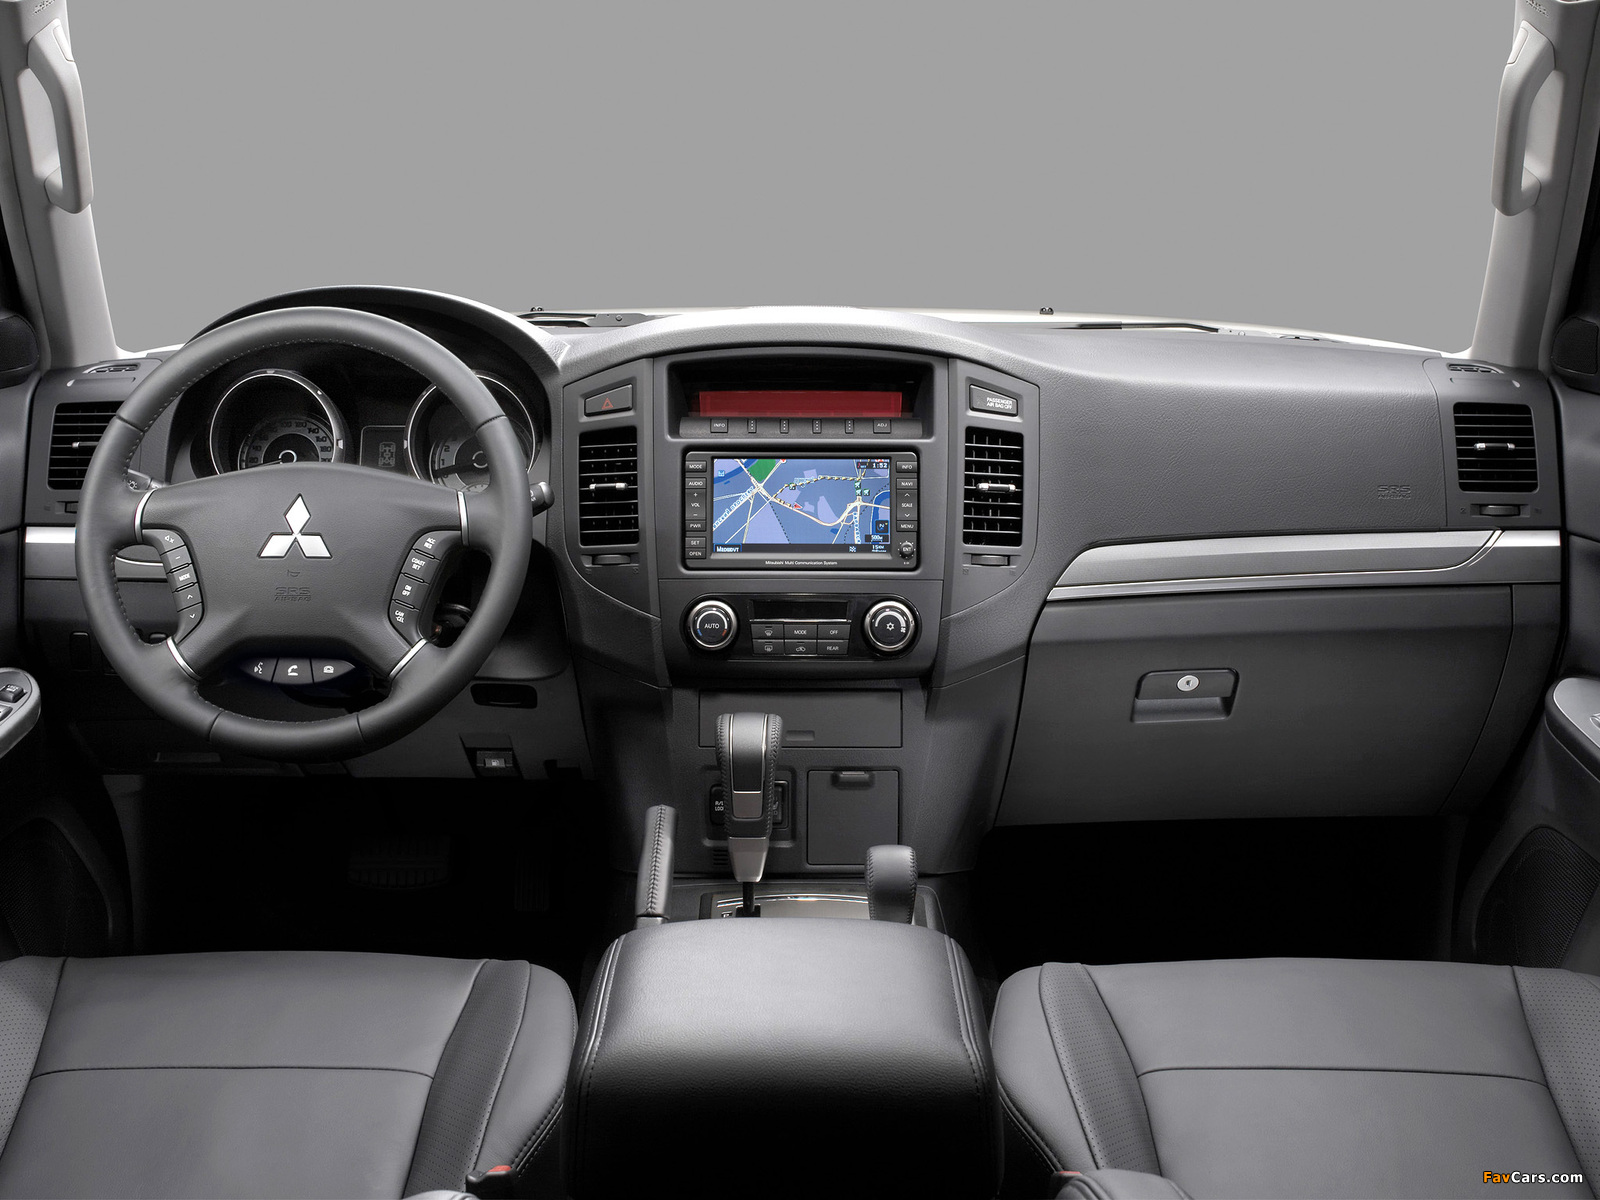 Mitsubishi Pajero 5-door 2011 photos (1600 x 1200)